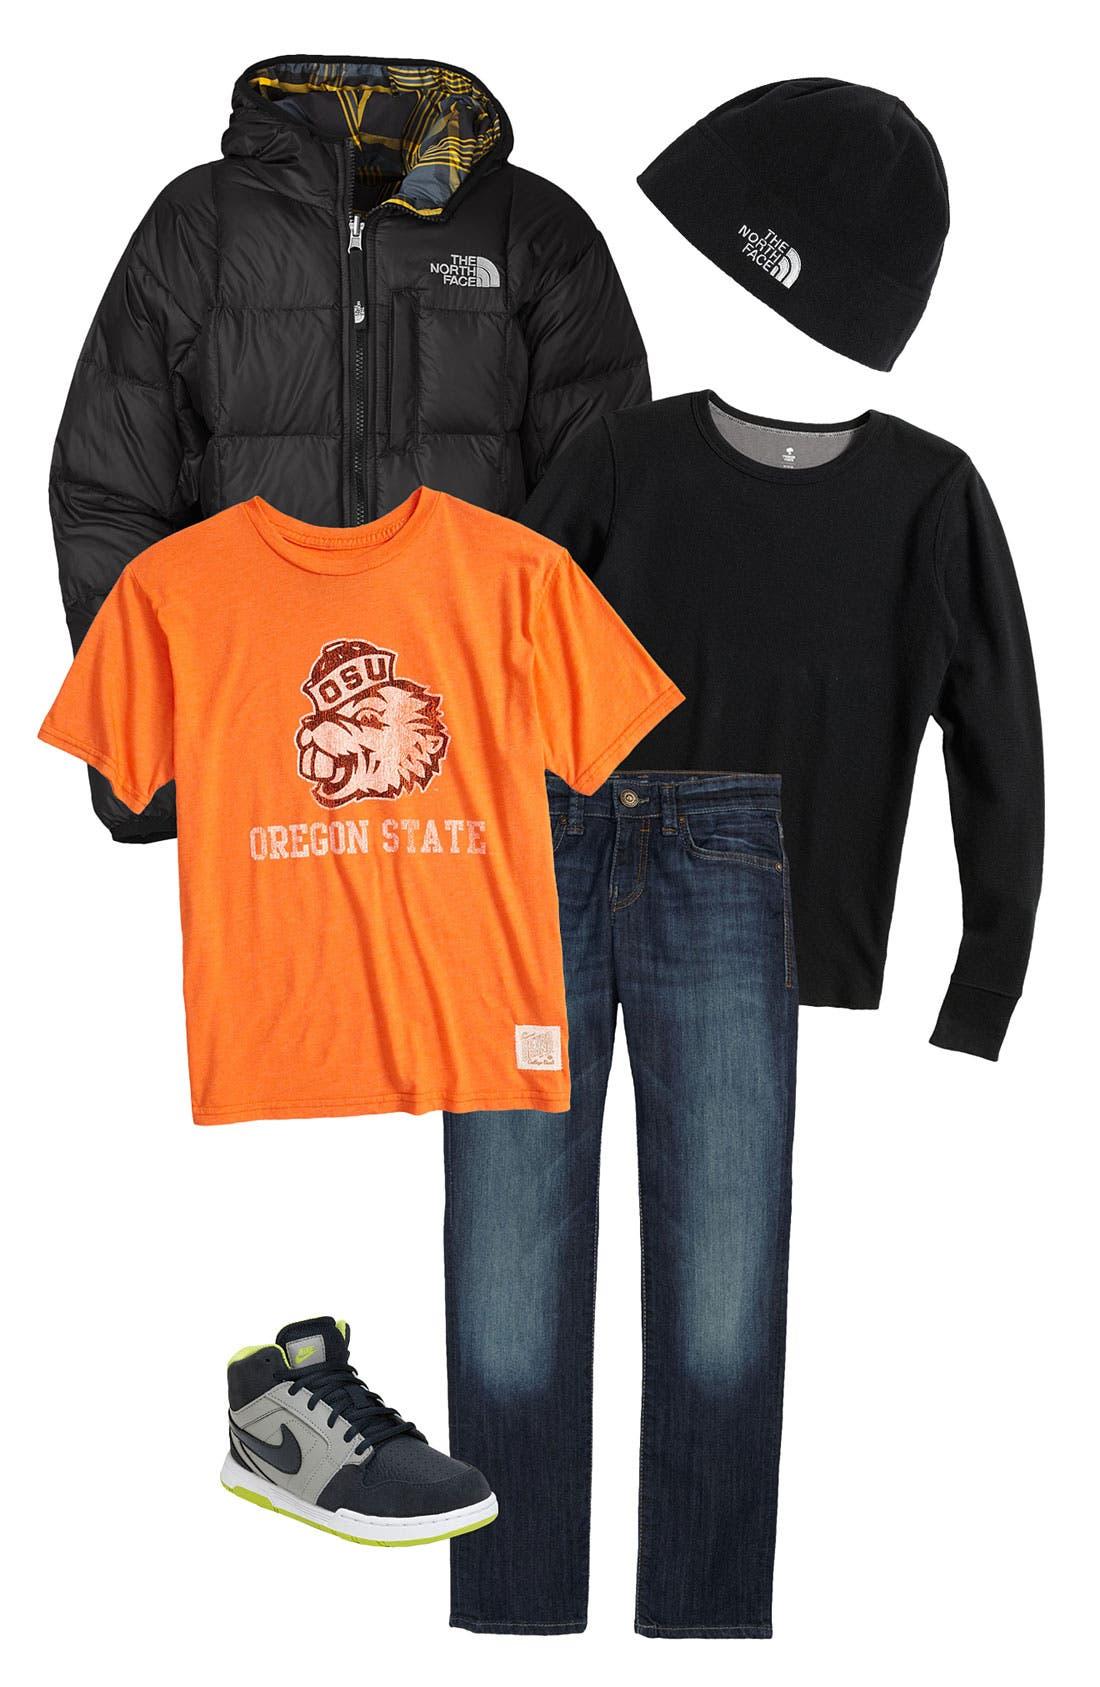 Alternate Image 1 Selected - Tucker + Tate Thermal Shirt, Retro Brand T-Shirt & The North Face Down Jacket (Big Boys)